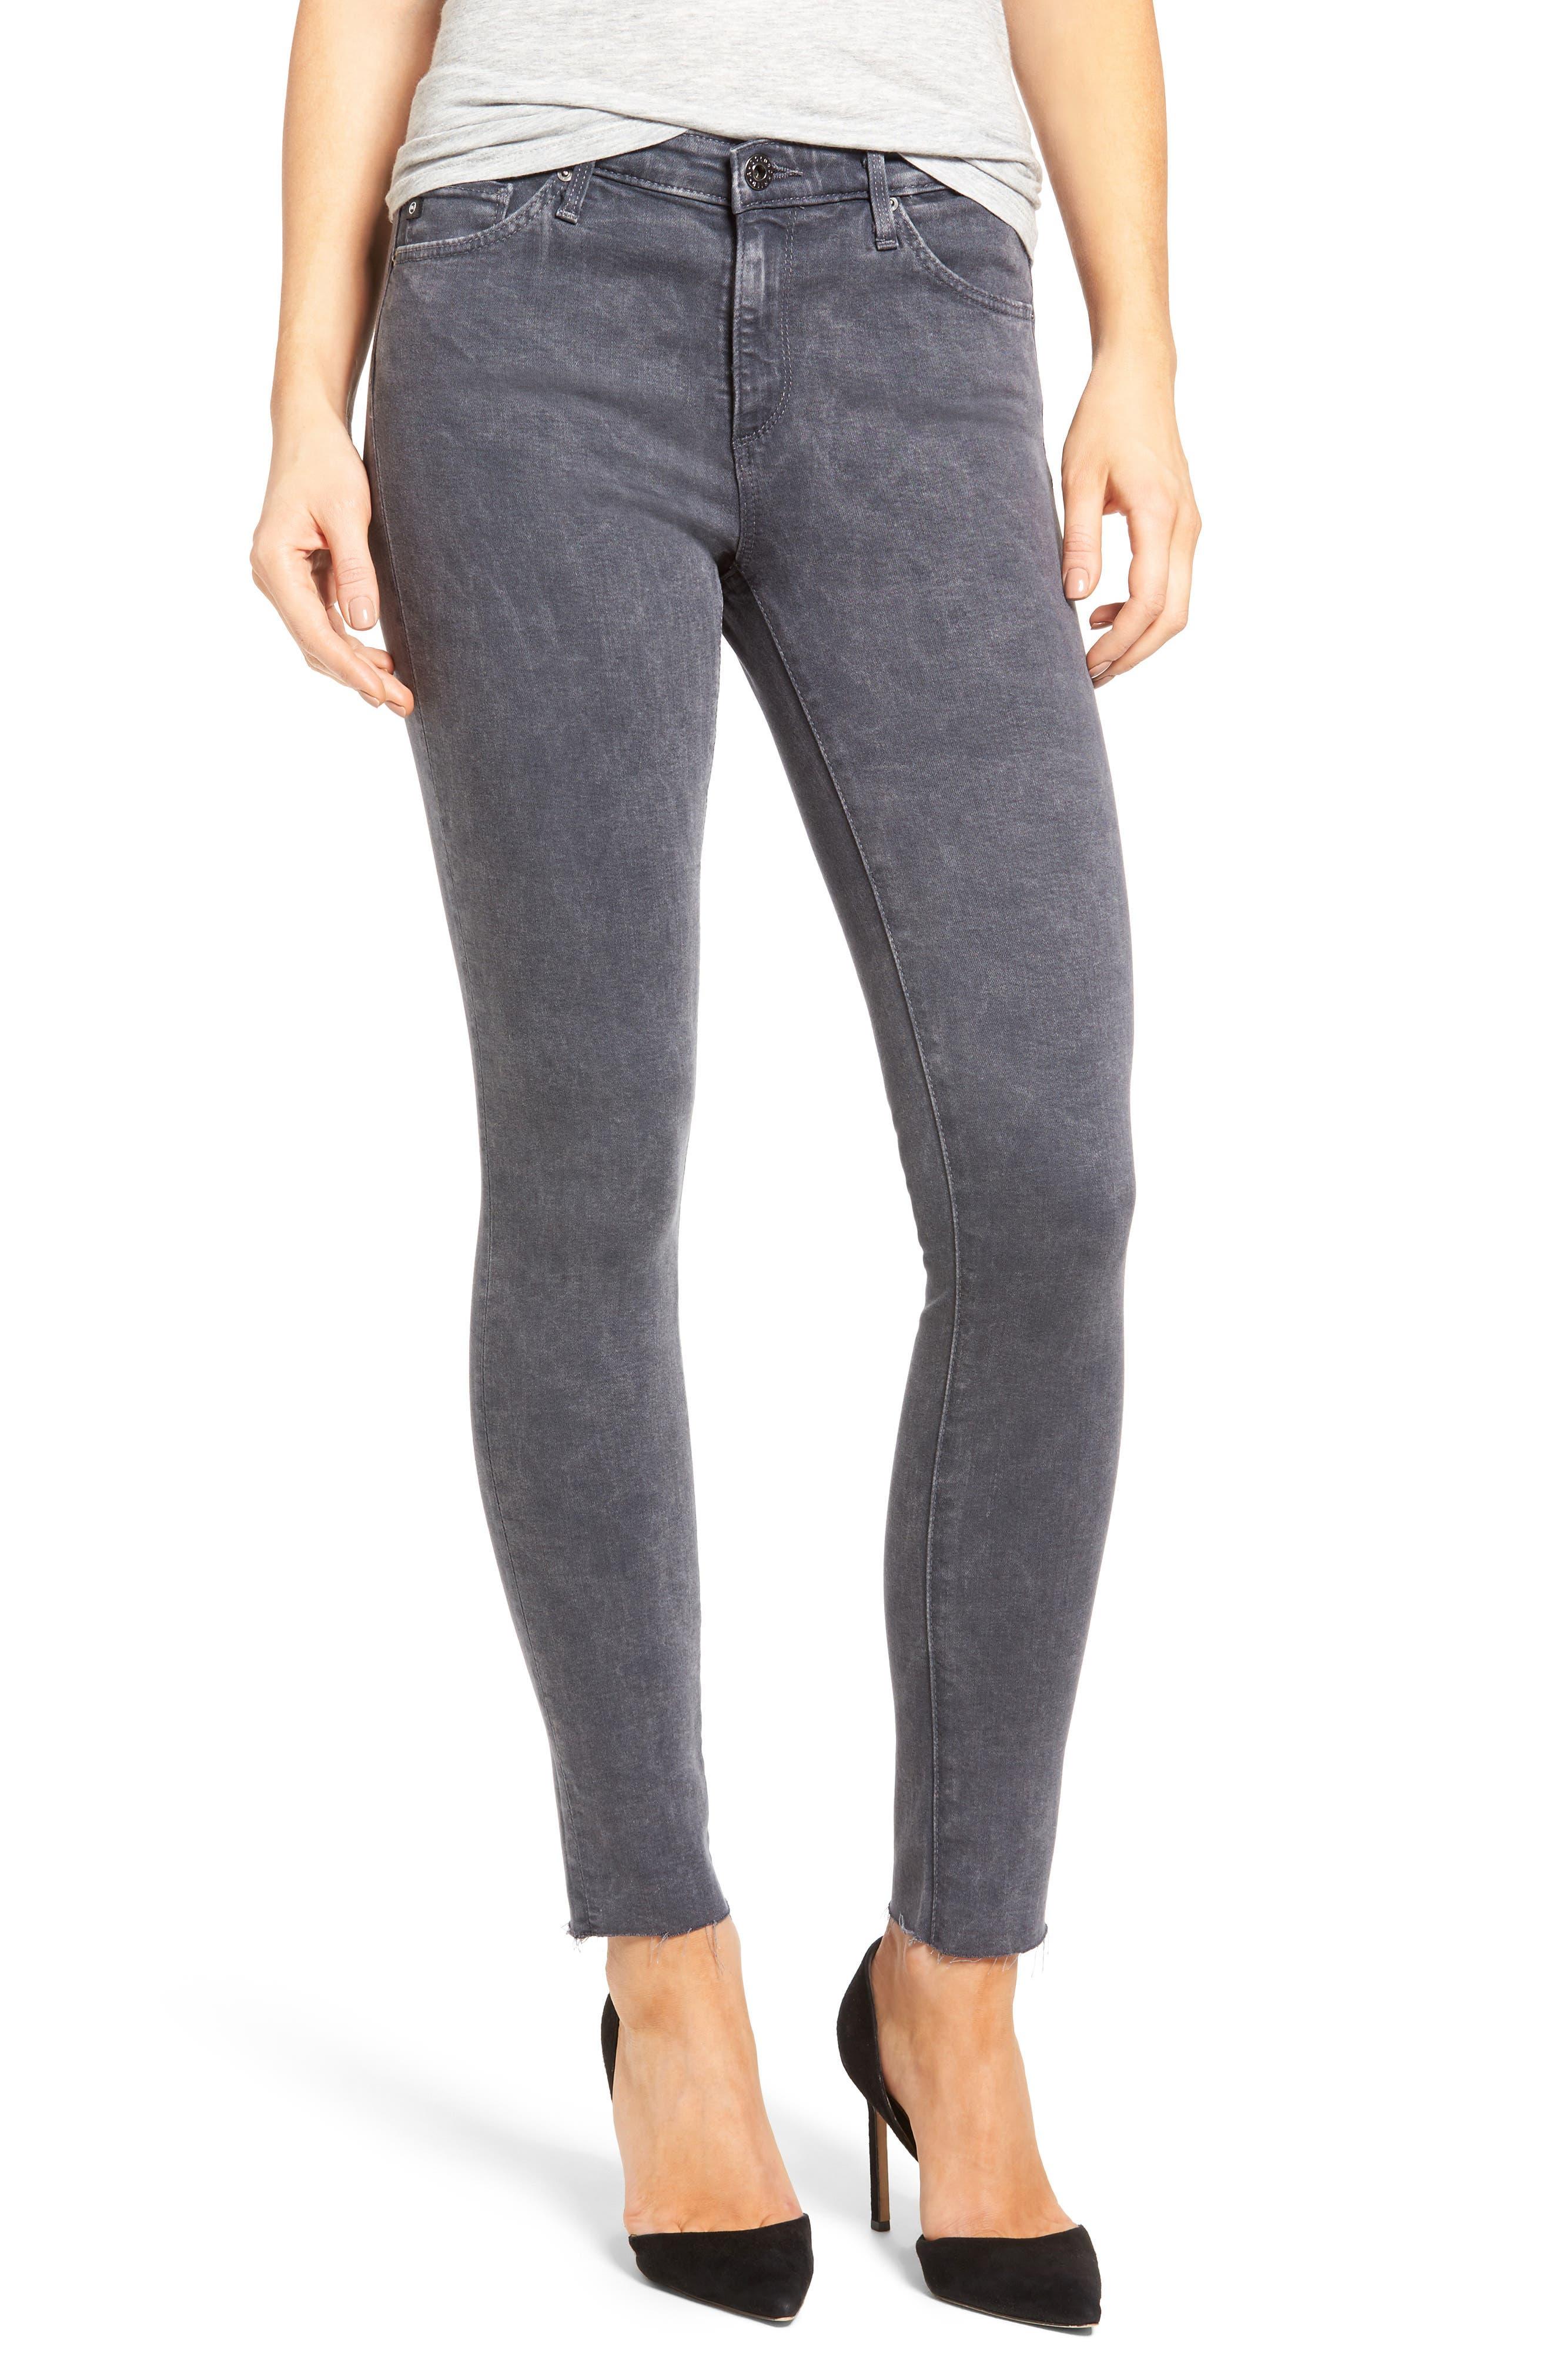 Middi Ankle Skinny Jeans,                         Main,                         color, 039